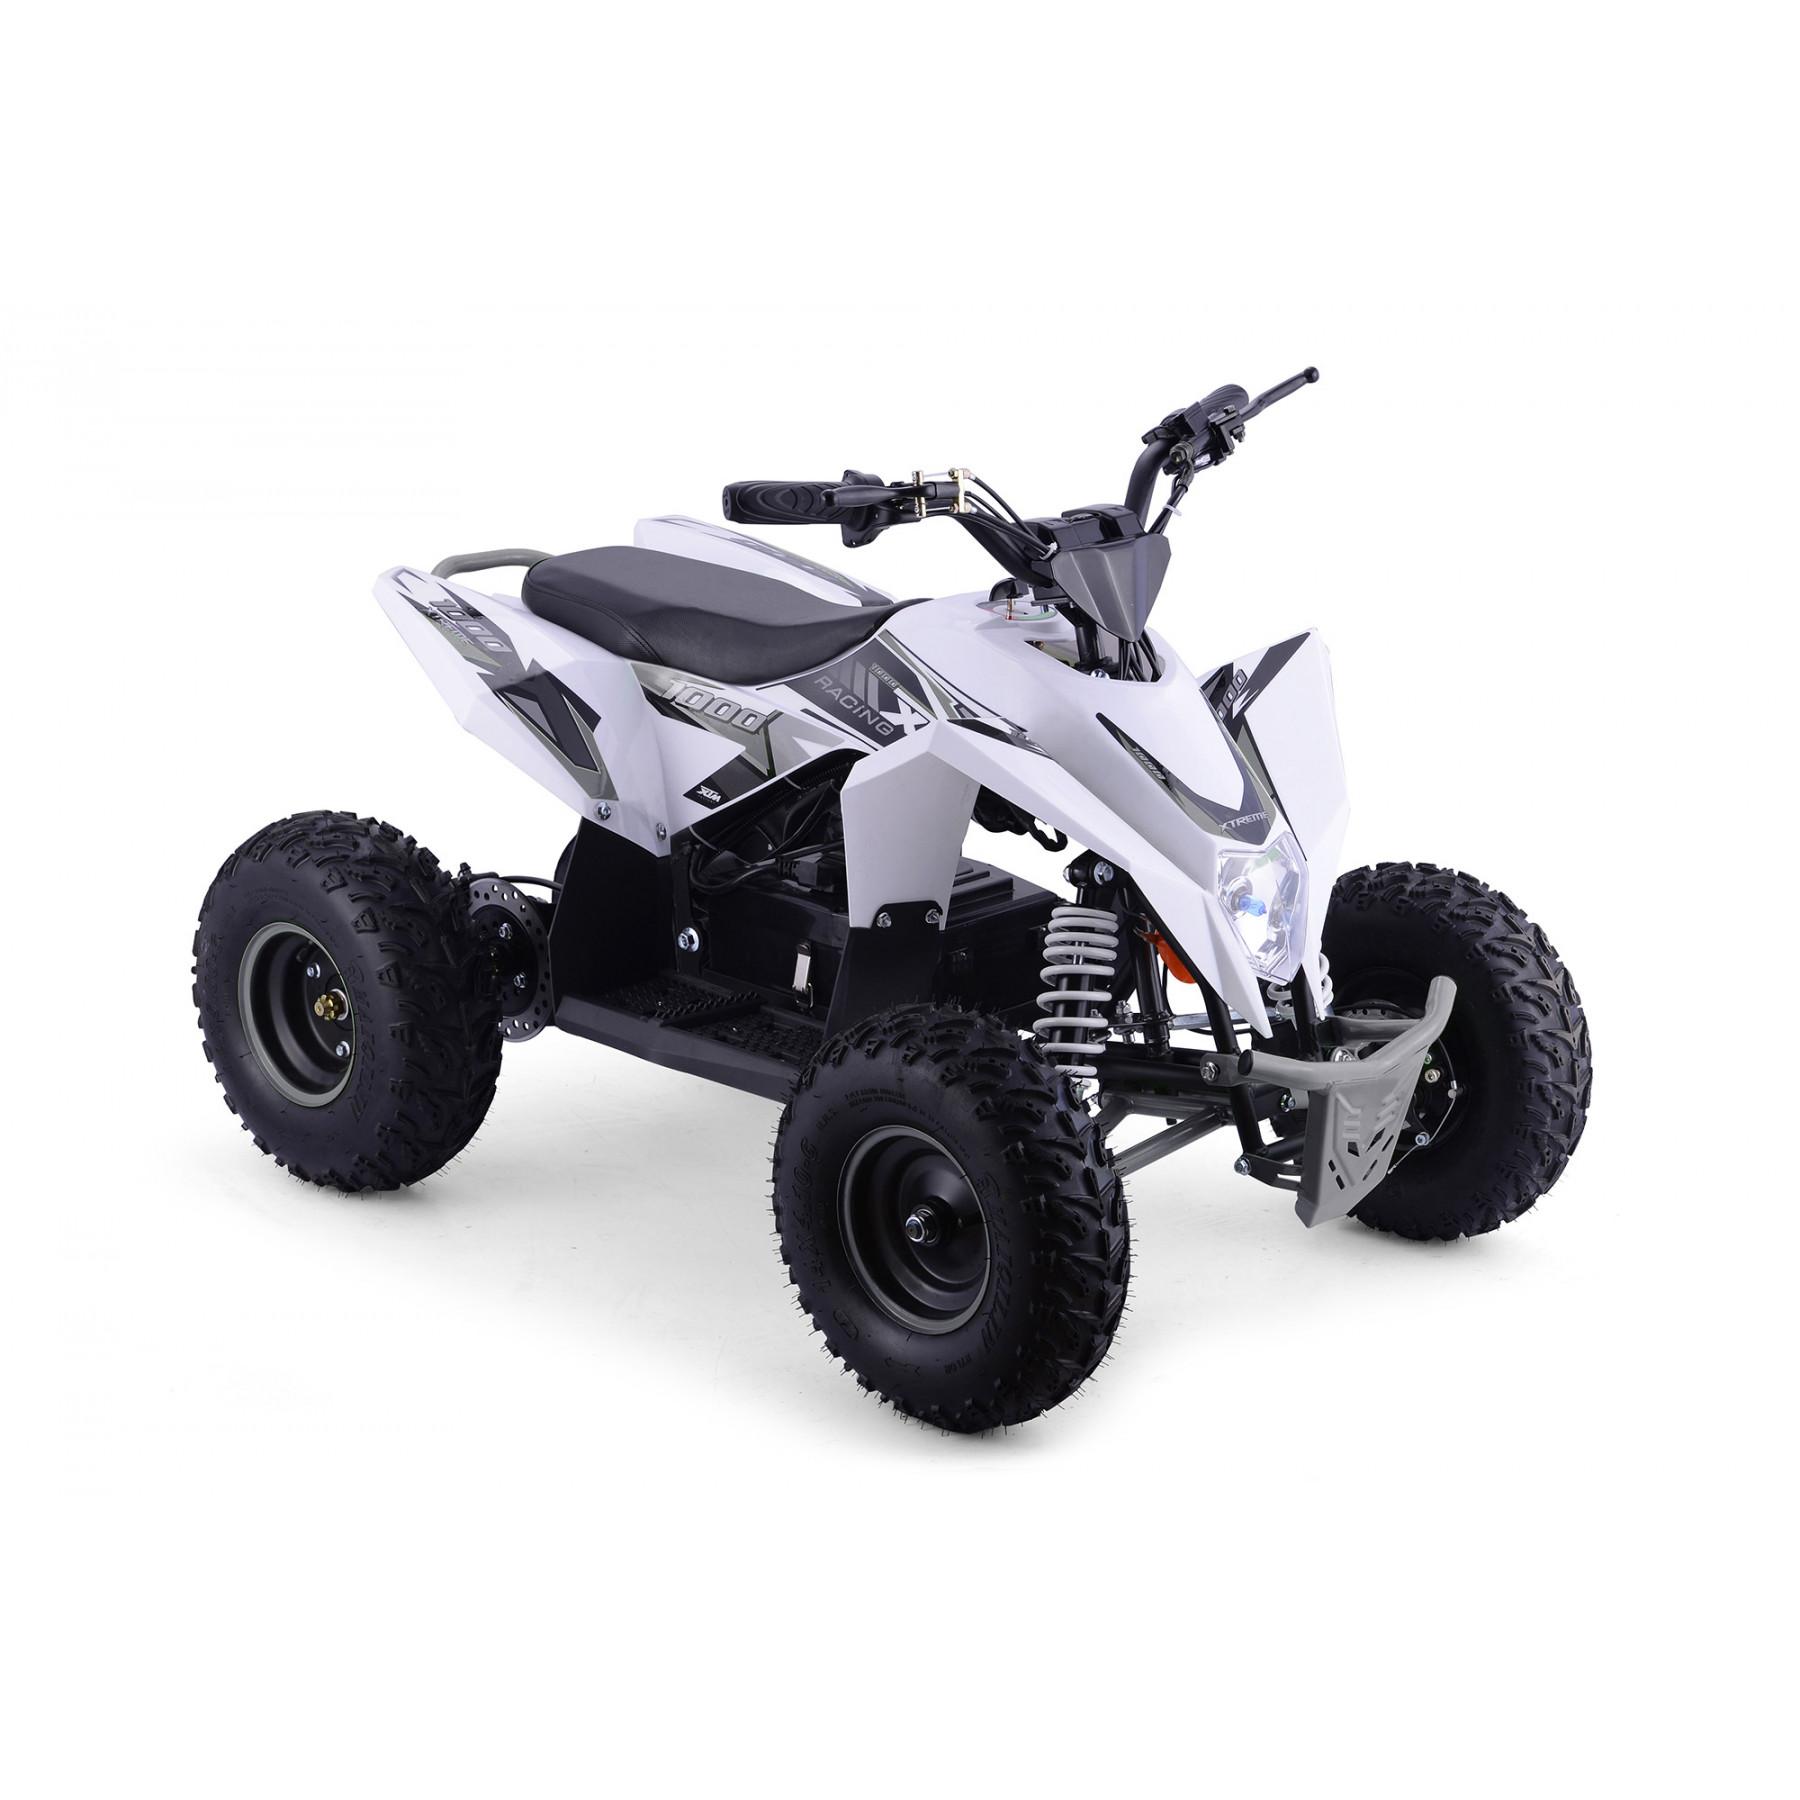 XTM RACING 1000w QUAD BIKE WHITE SILVER